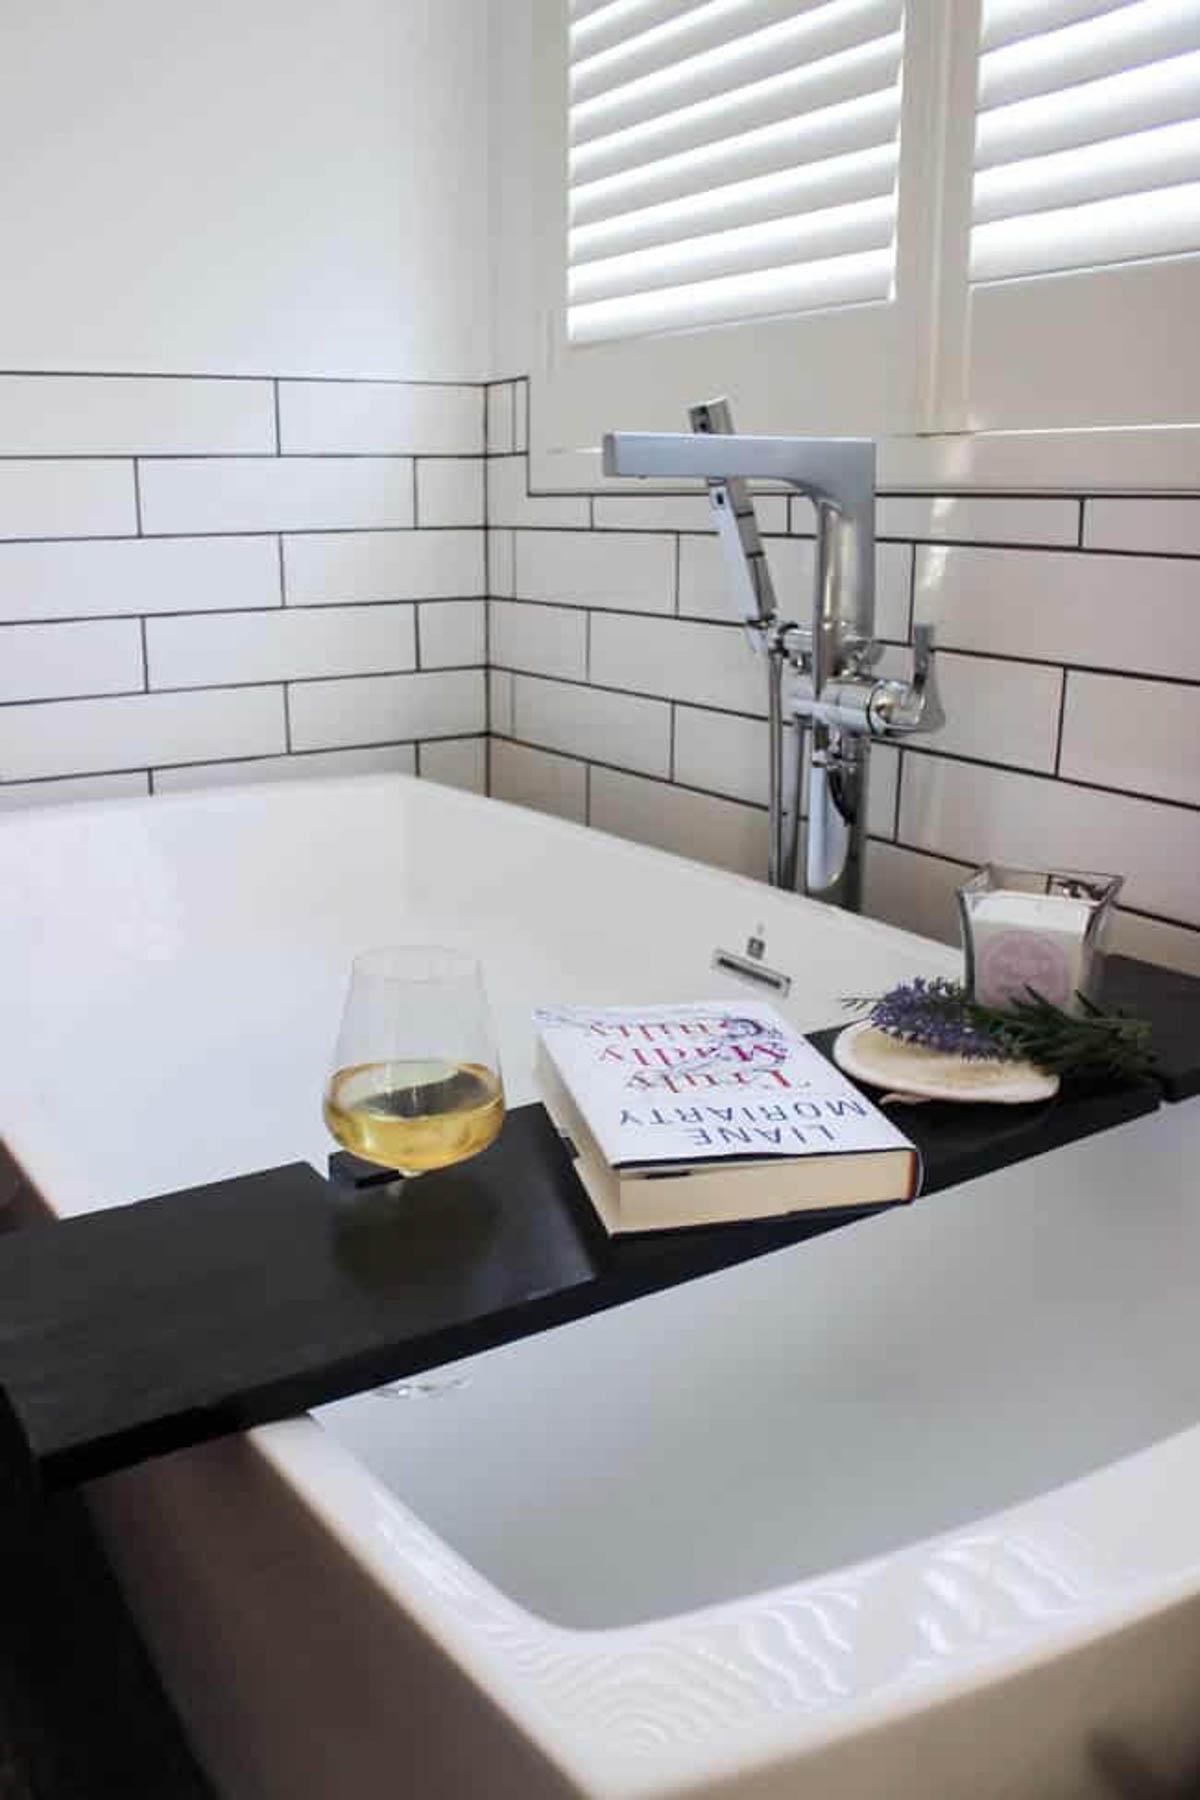 Tub with DIY bath tray with wine glass holder